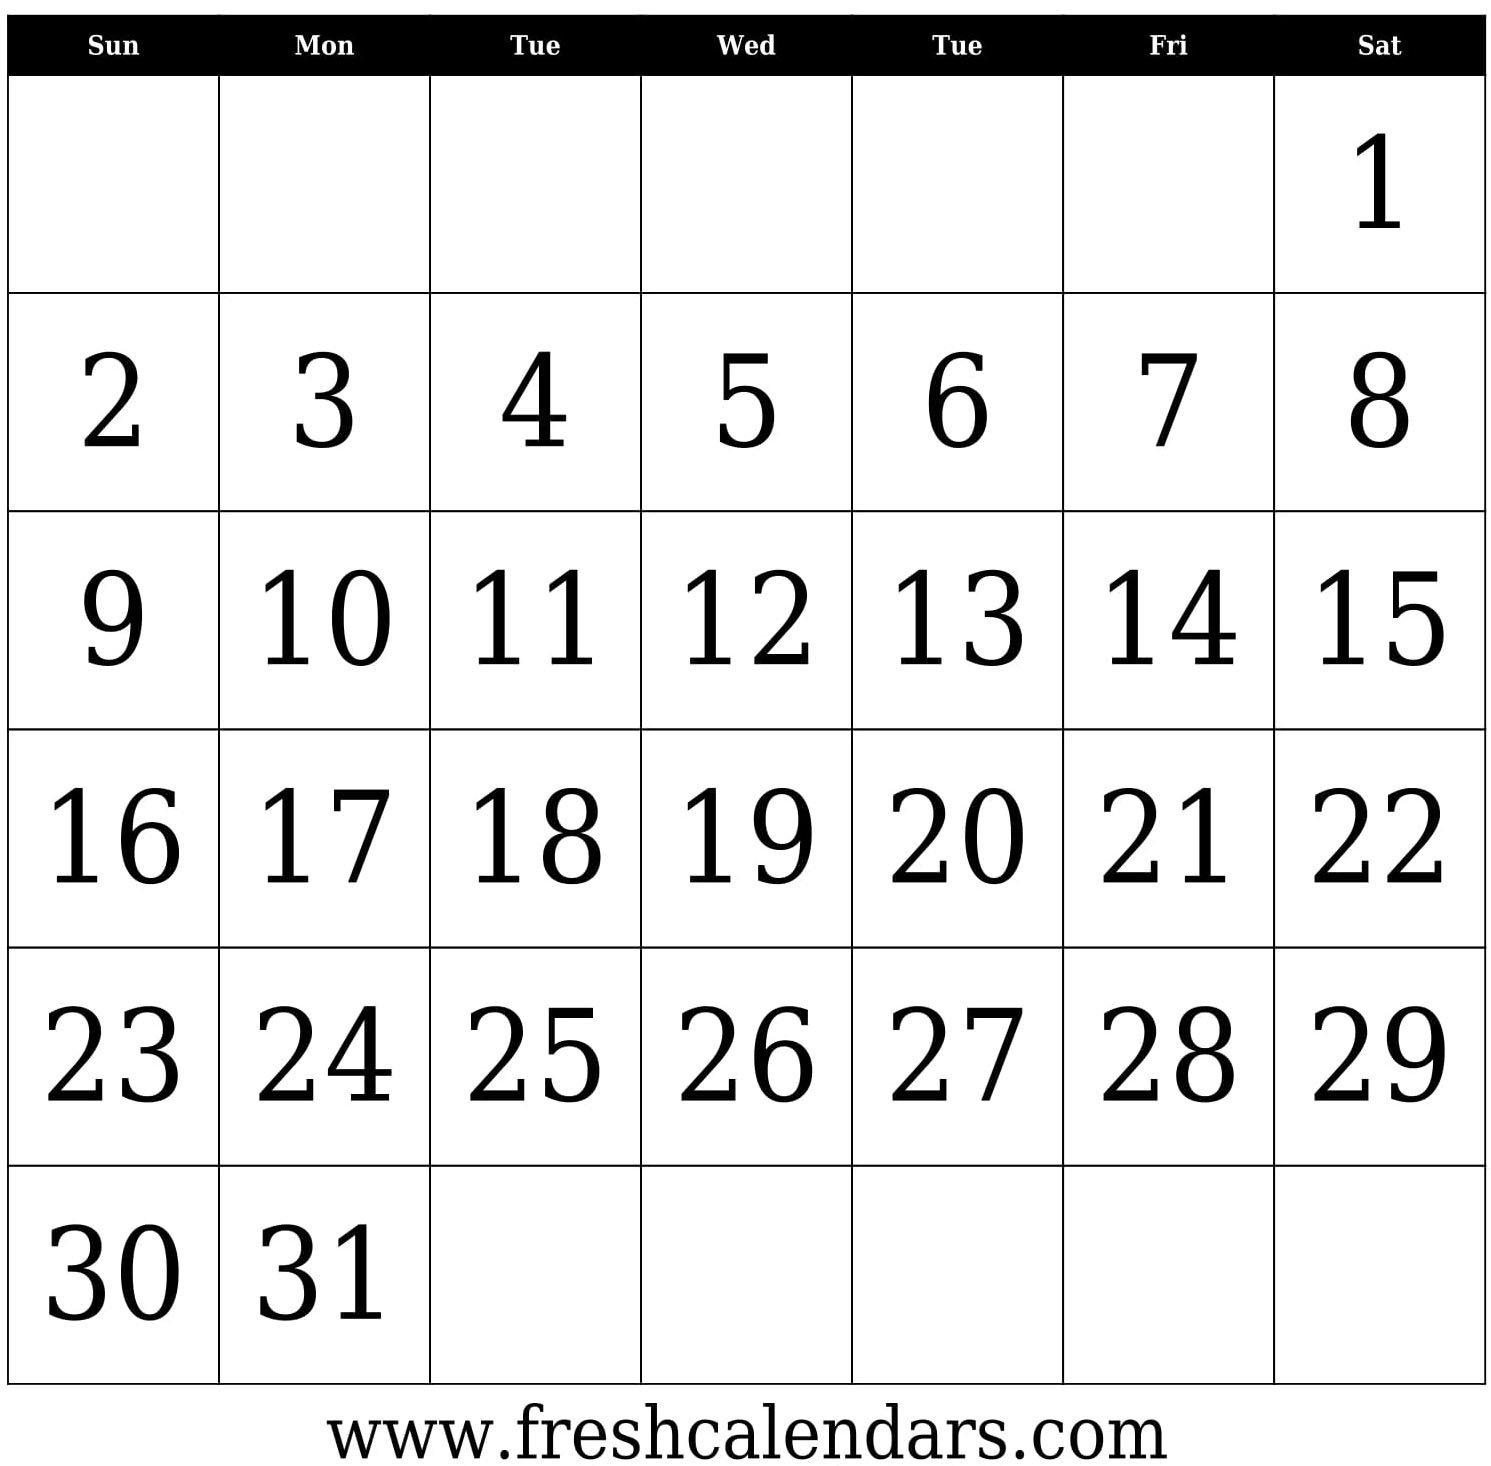 31 Day Calendar Template Printable – Samyysandra 31 Day Calendar Templates